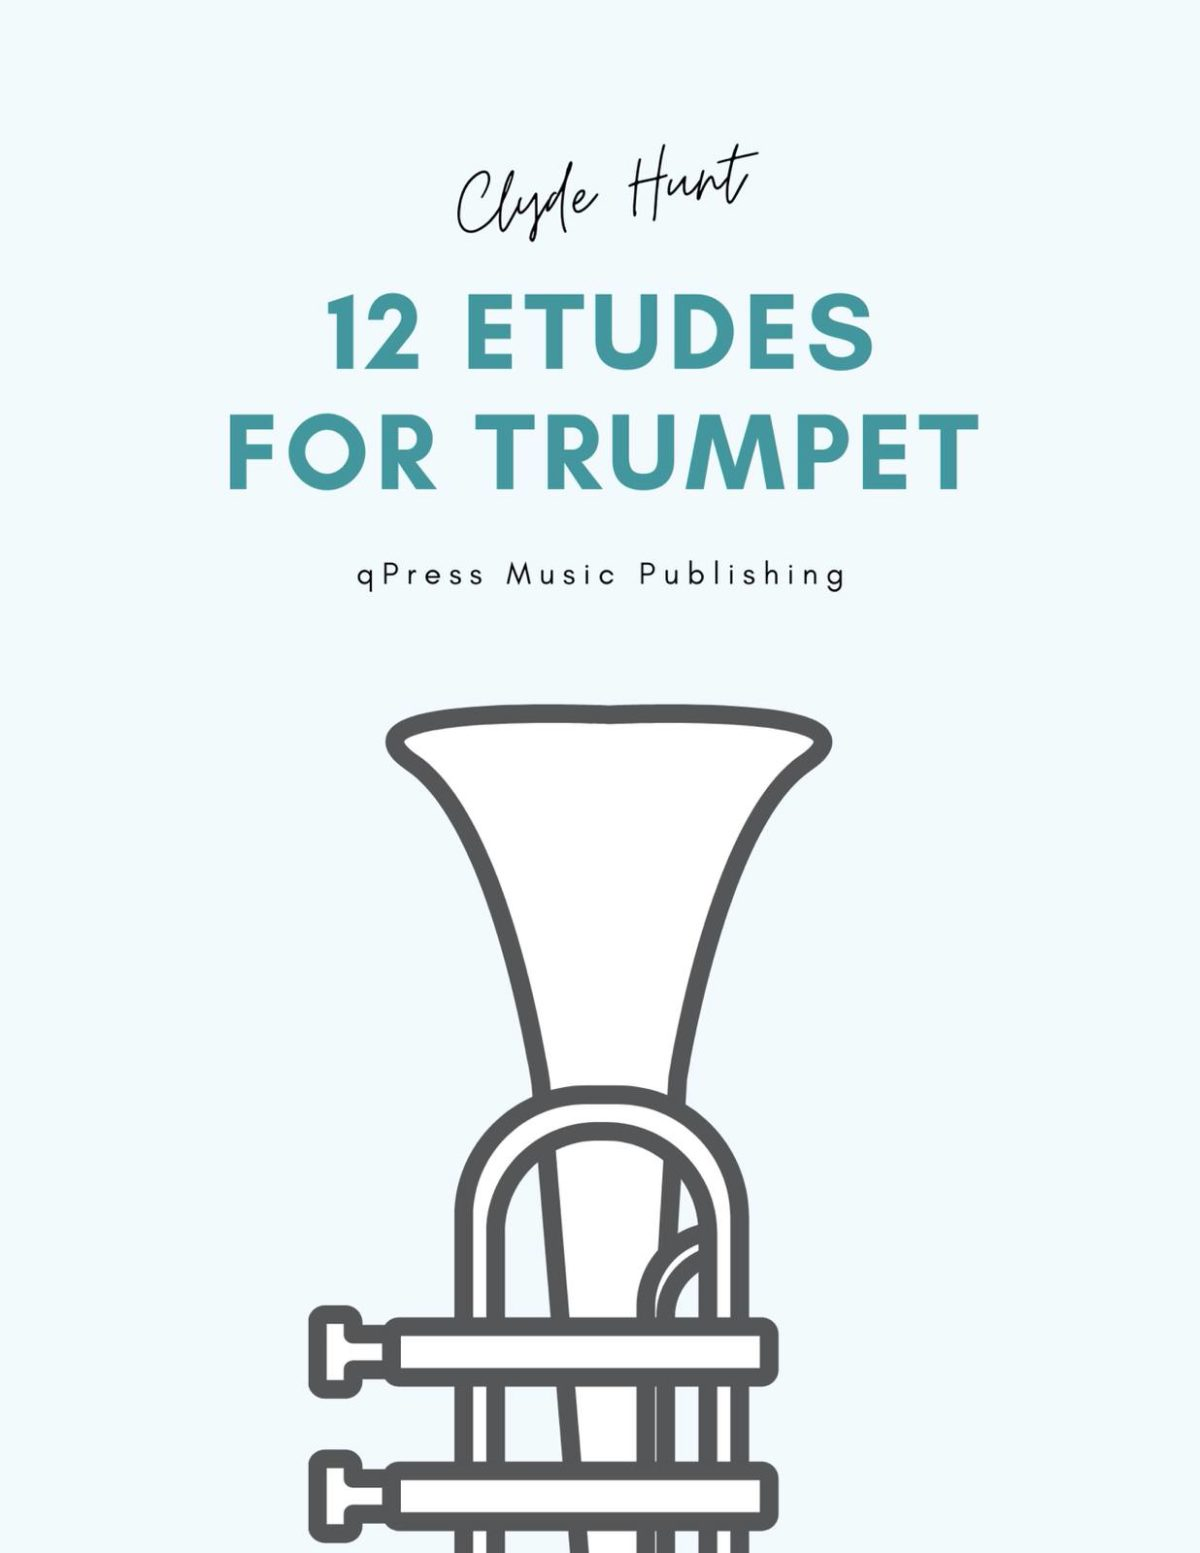 Hunt, 12 Etudes for Trumpet-p01